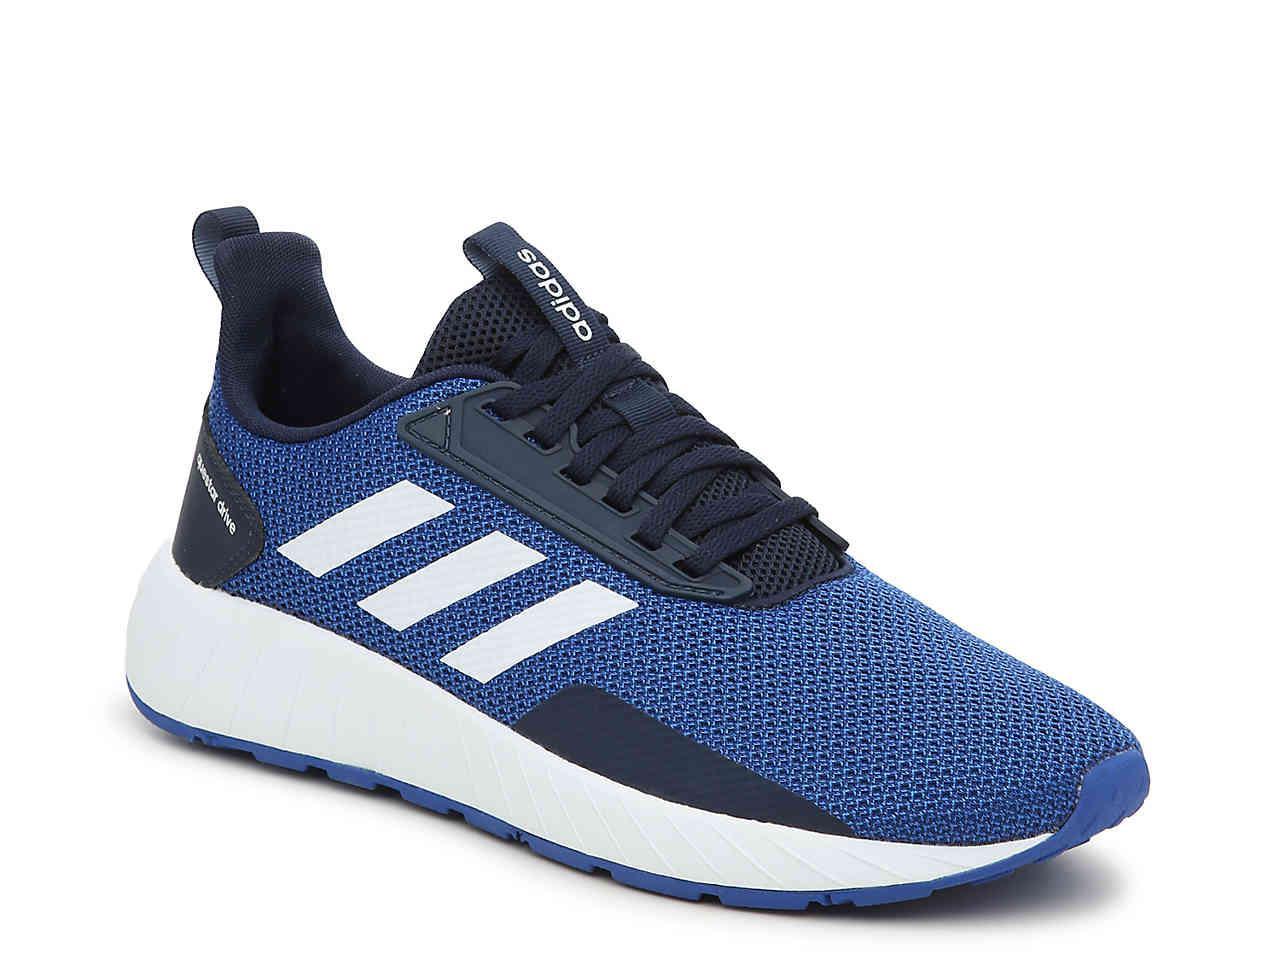 lyst adidas questar guidare da ginnastica in blu per gli uomini.